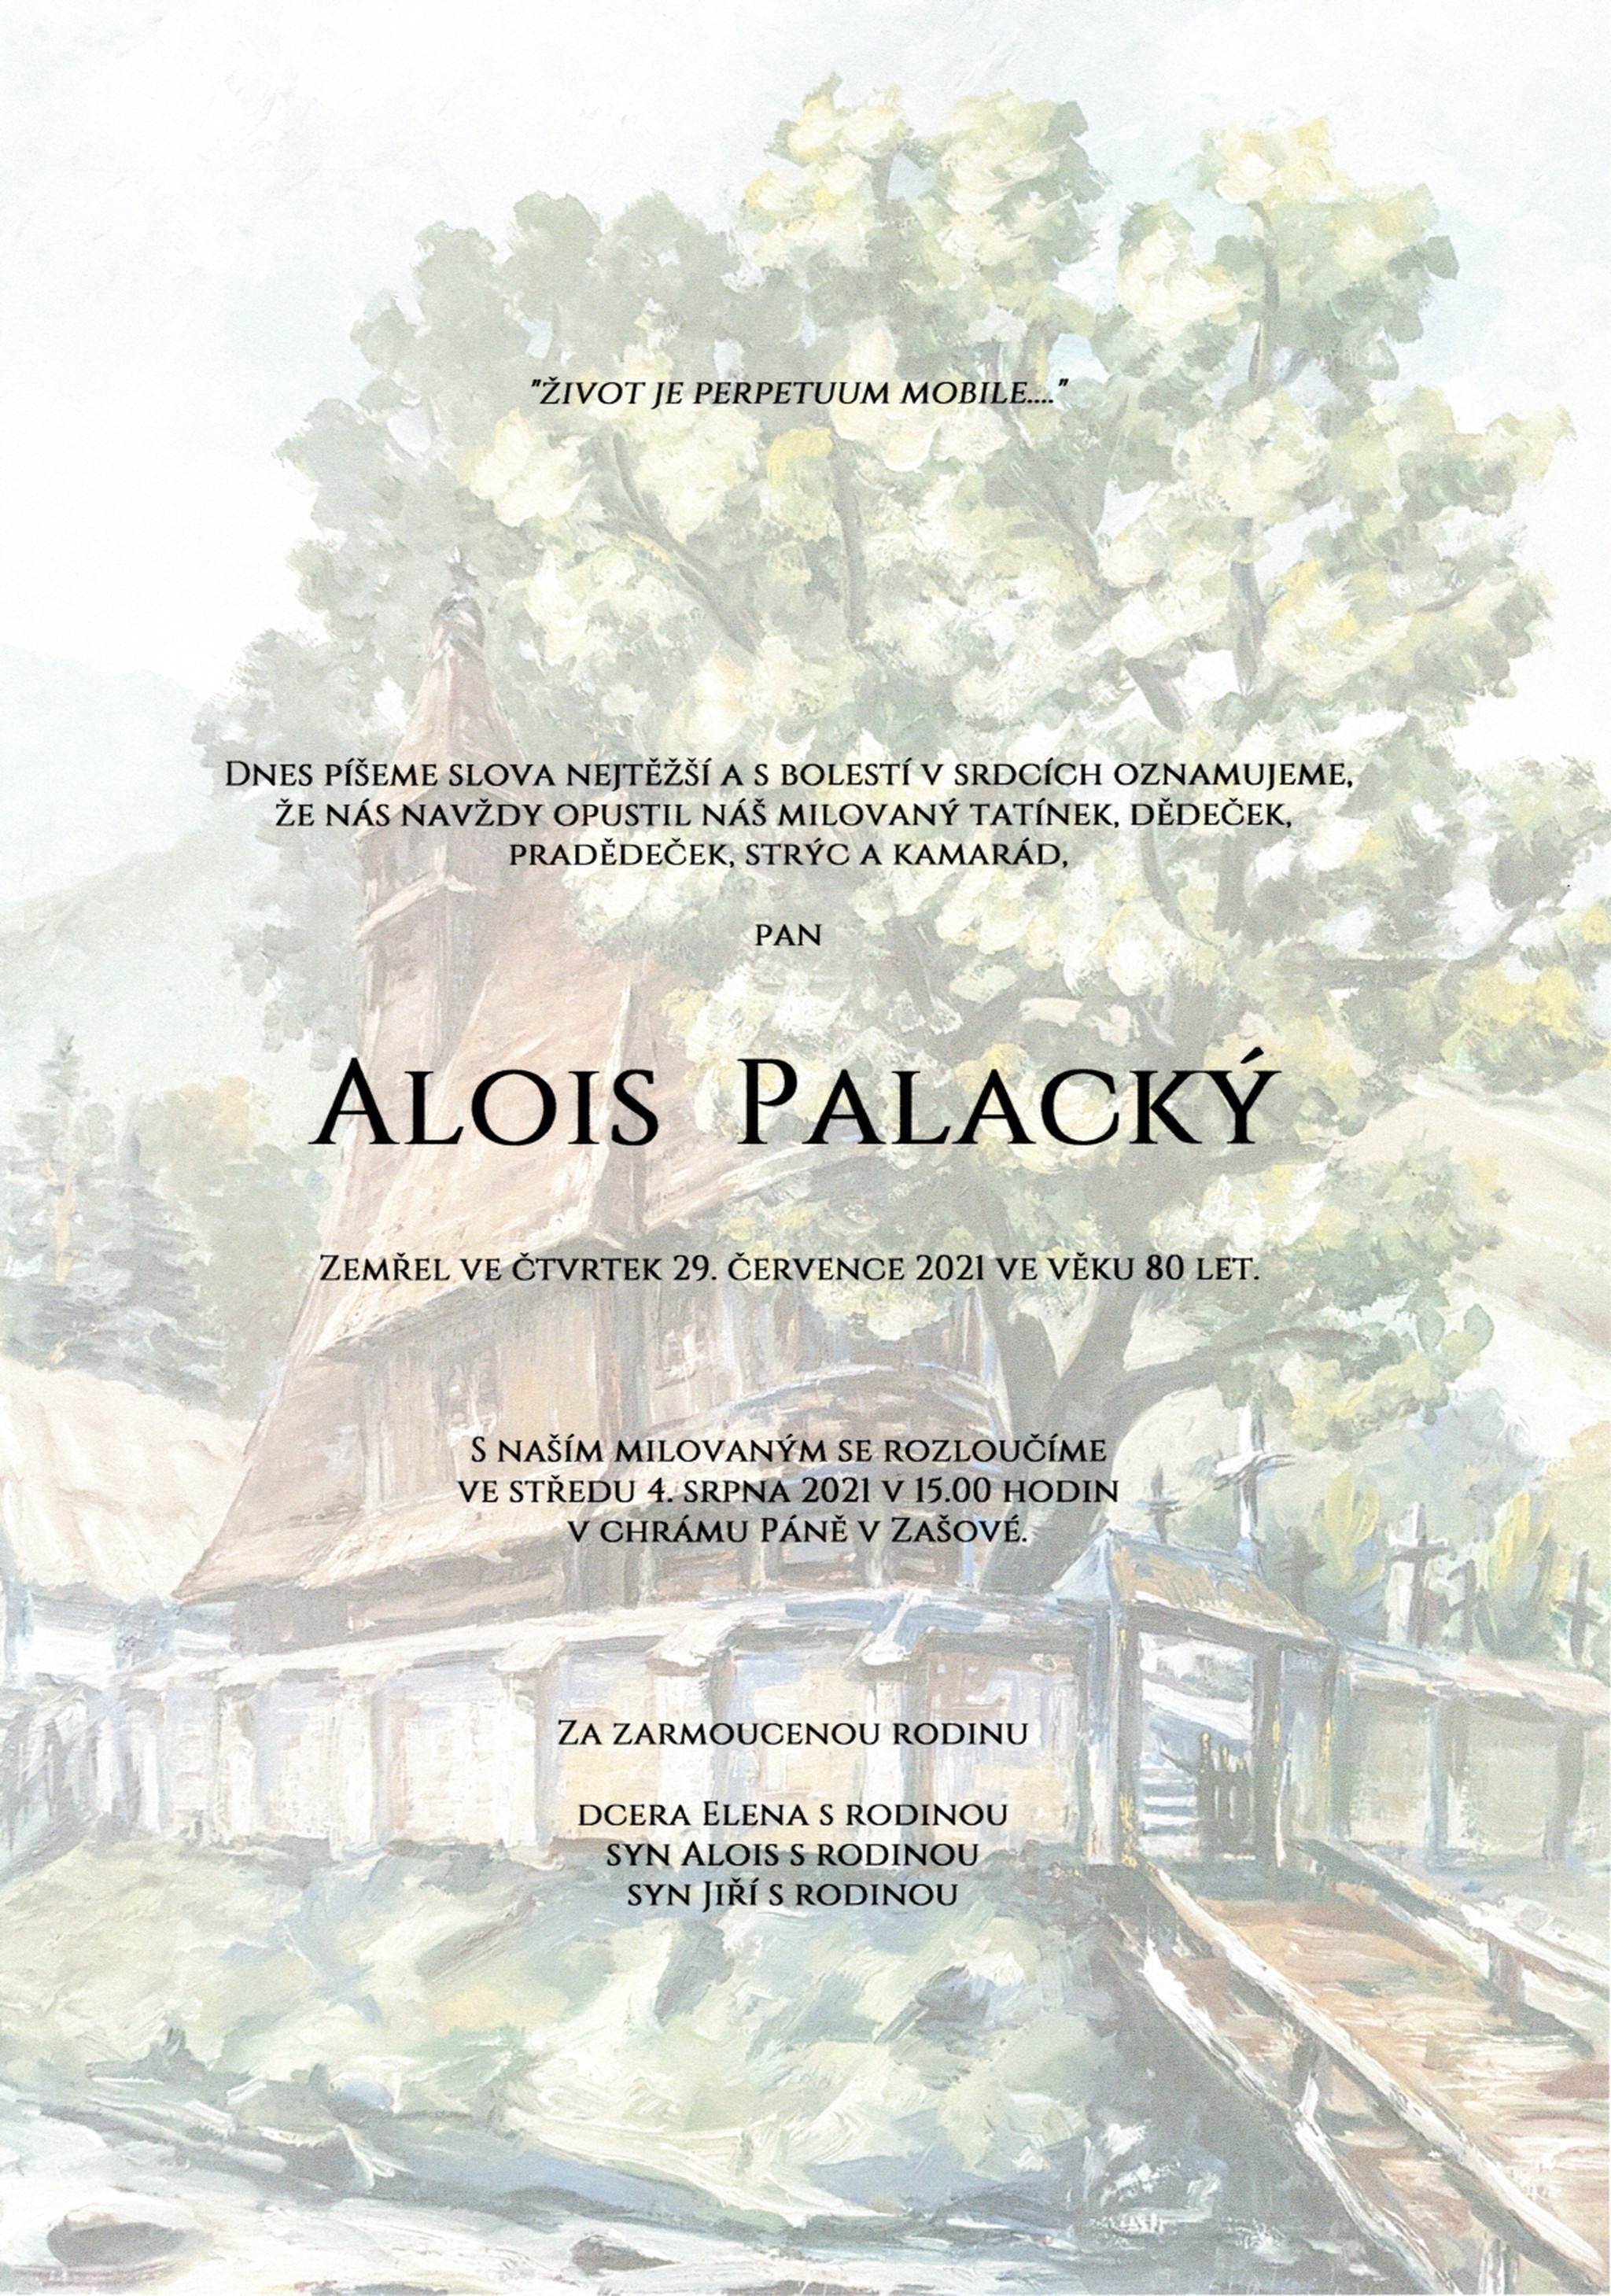 Alois Palacký